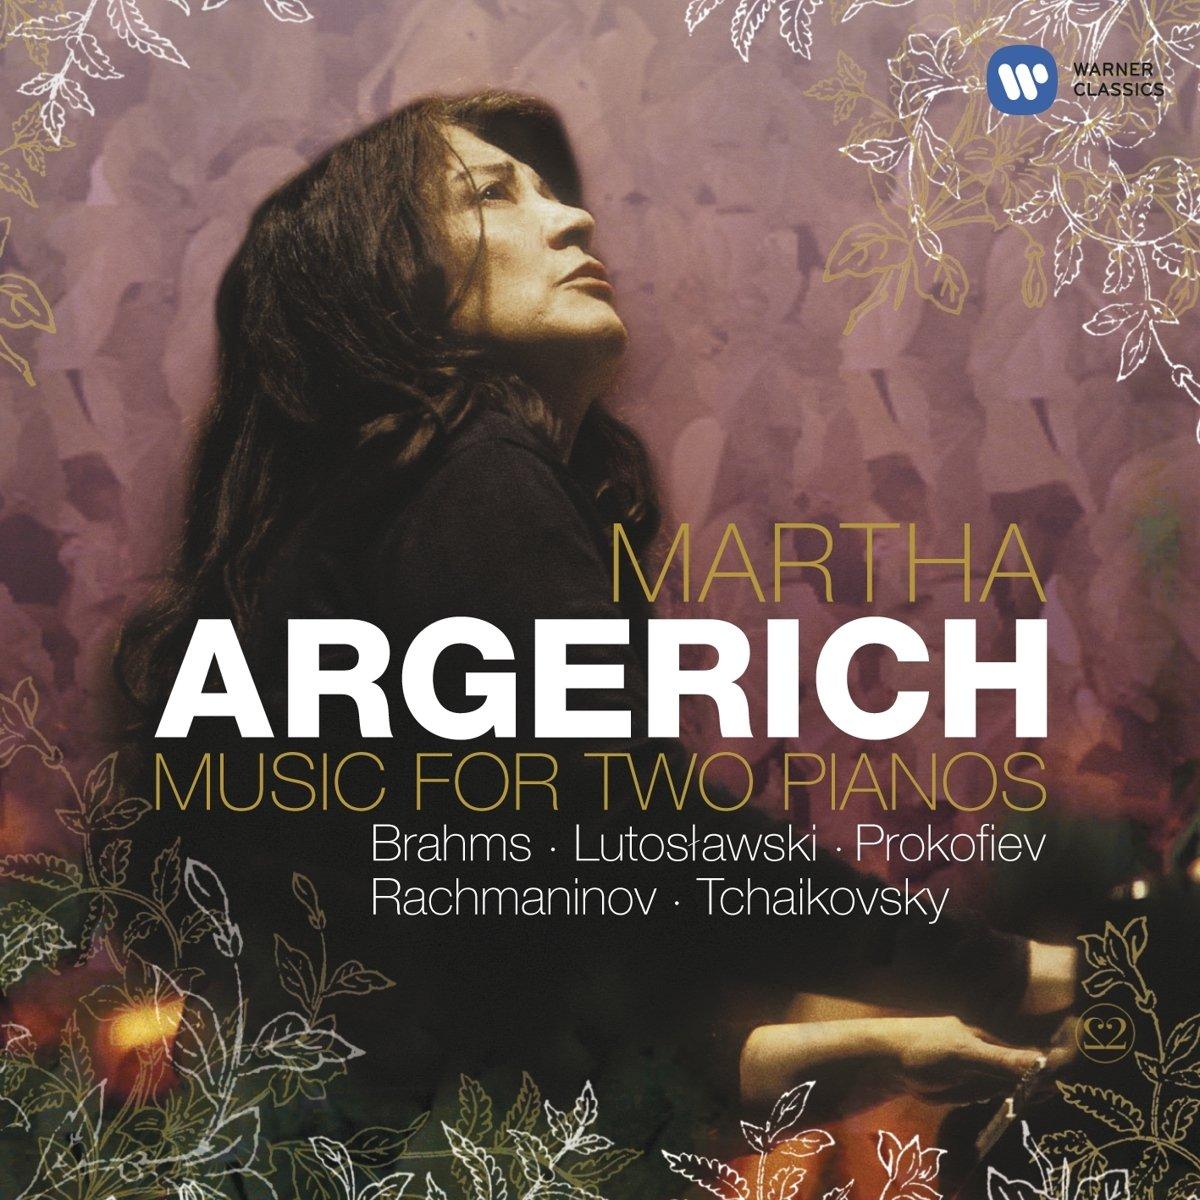 Brahms/Lutoslawski/Prokofiev/Rachmaninov/Tchaikovsky: Music for Two Pianos